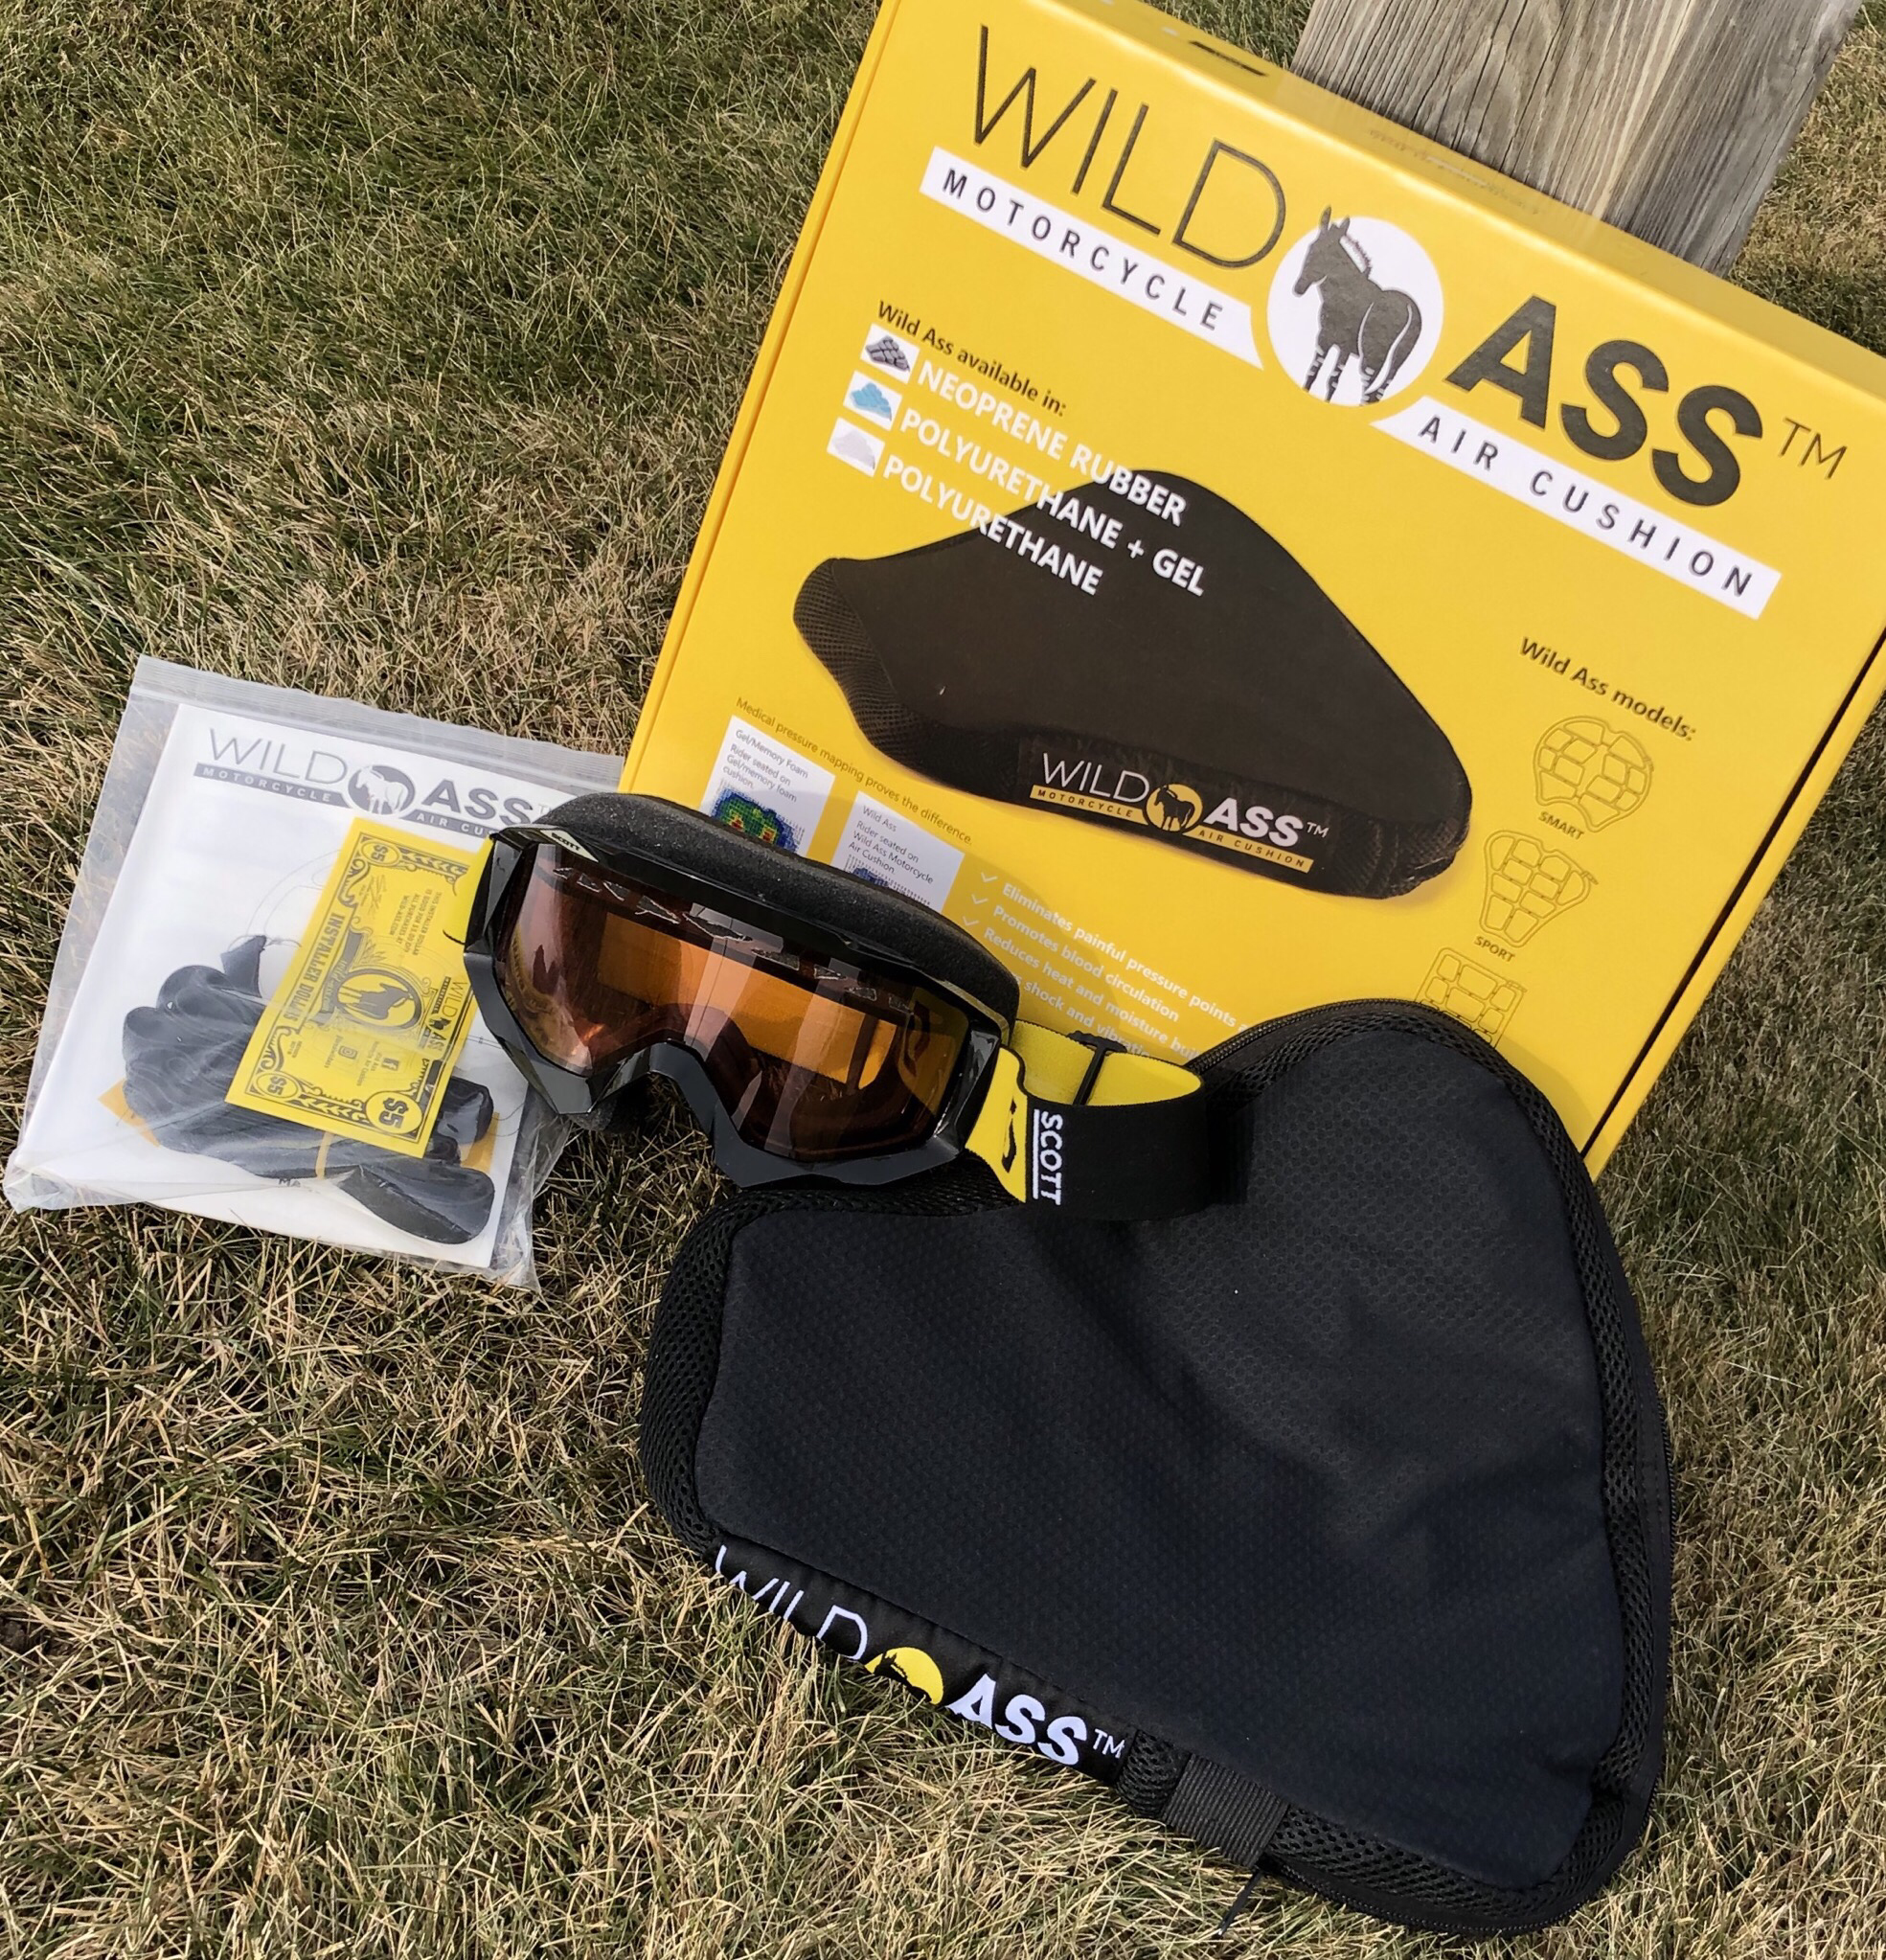 Wild Ass Adventure Kit